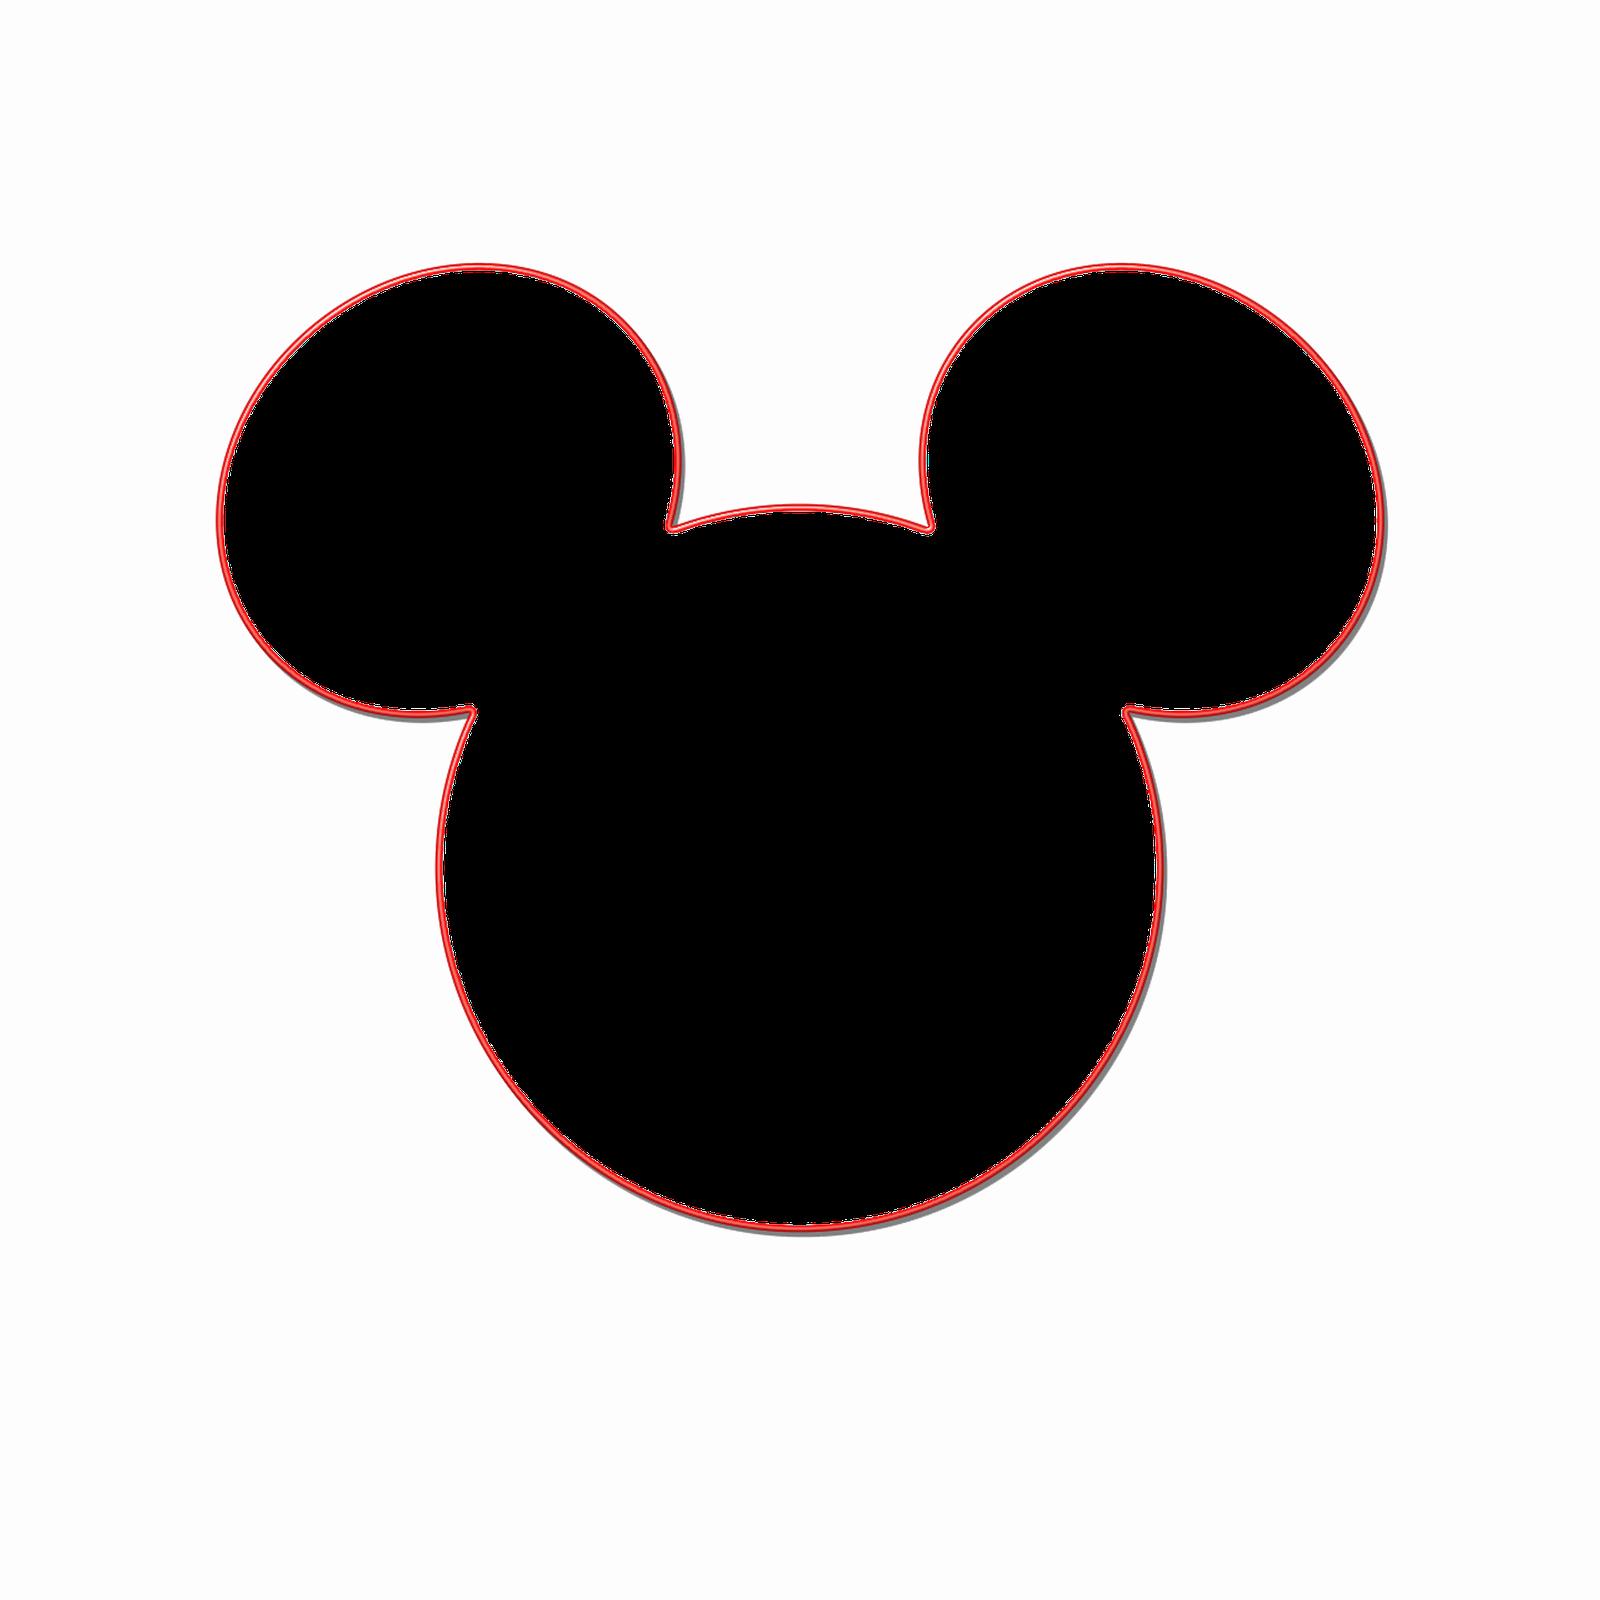 Milliepie S Musings Making Your Own Mickey Head